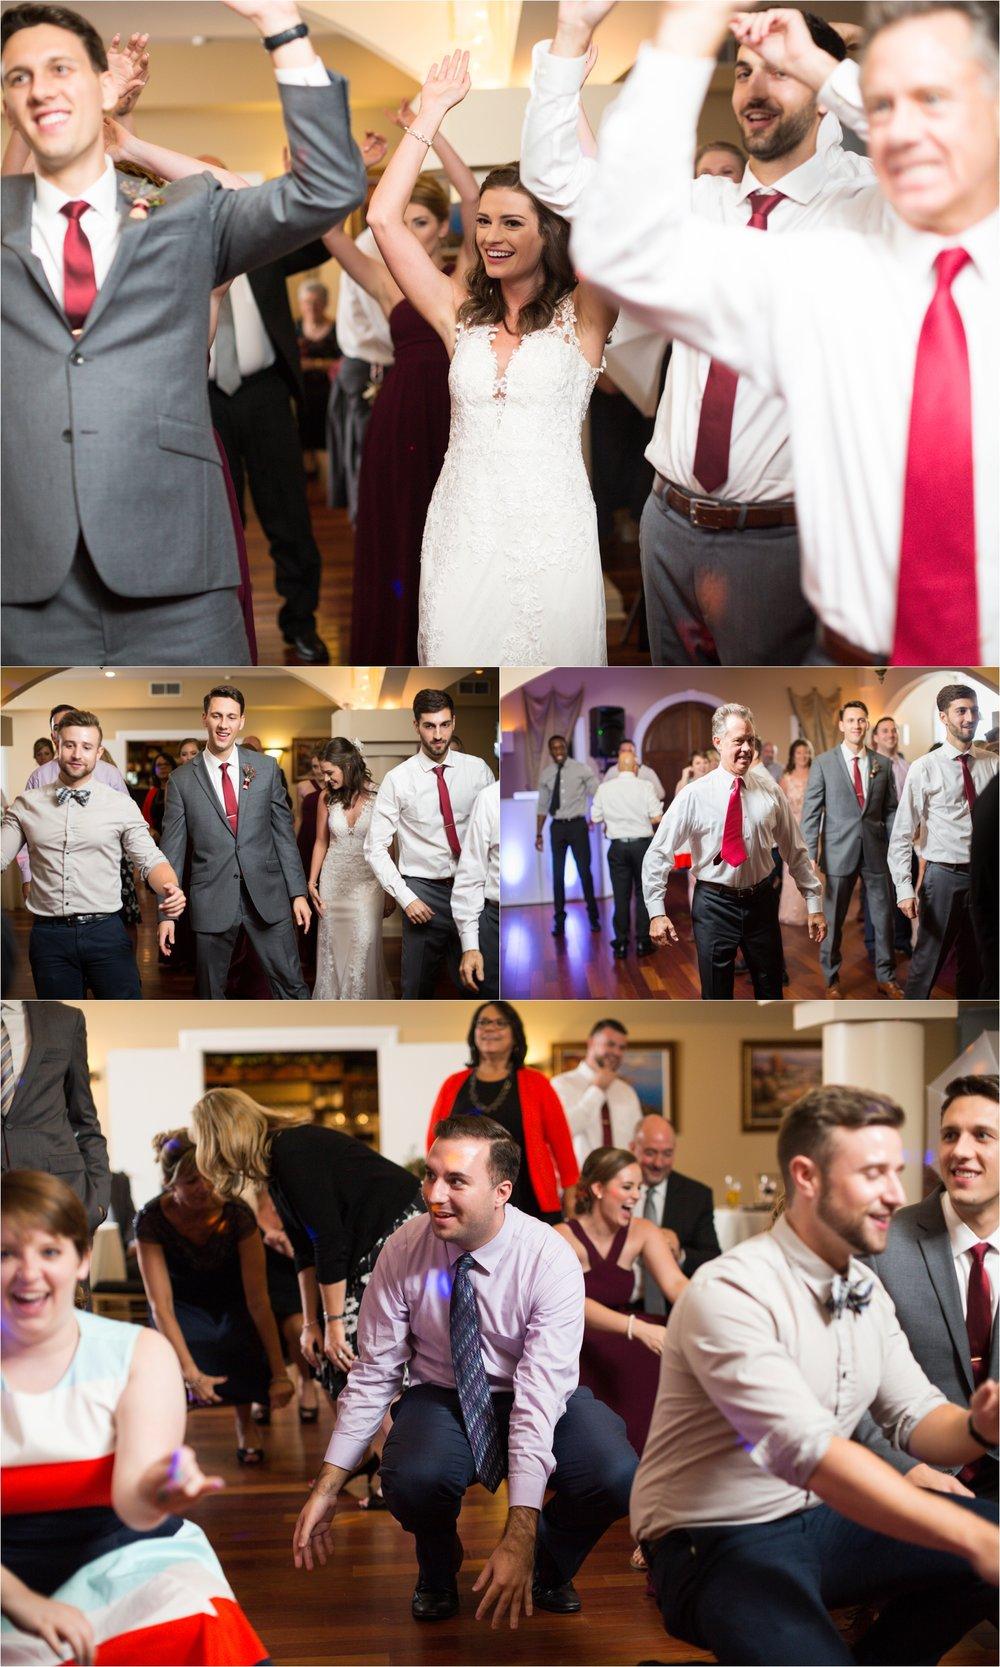 Feather-and-Oak-Photography-Cross-Keys-Vineyard-Wedding-1614.jpg